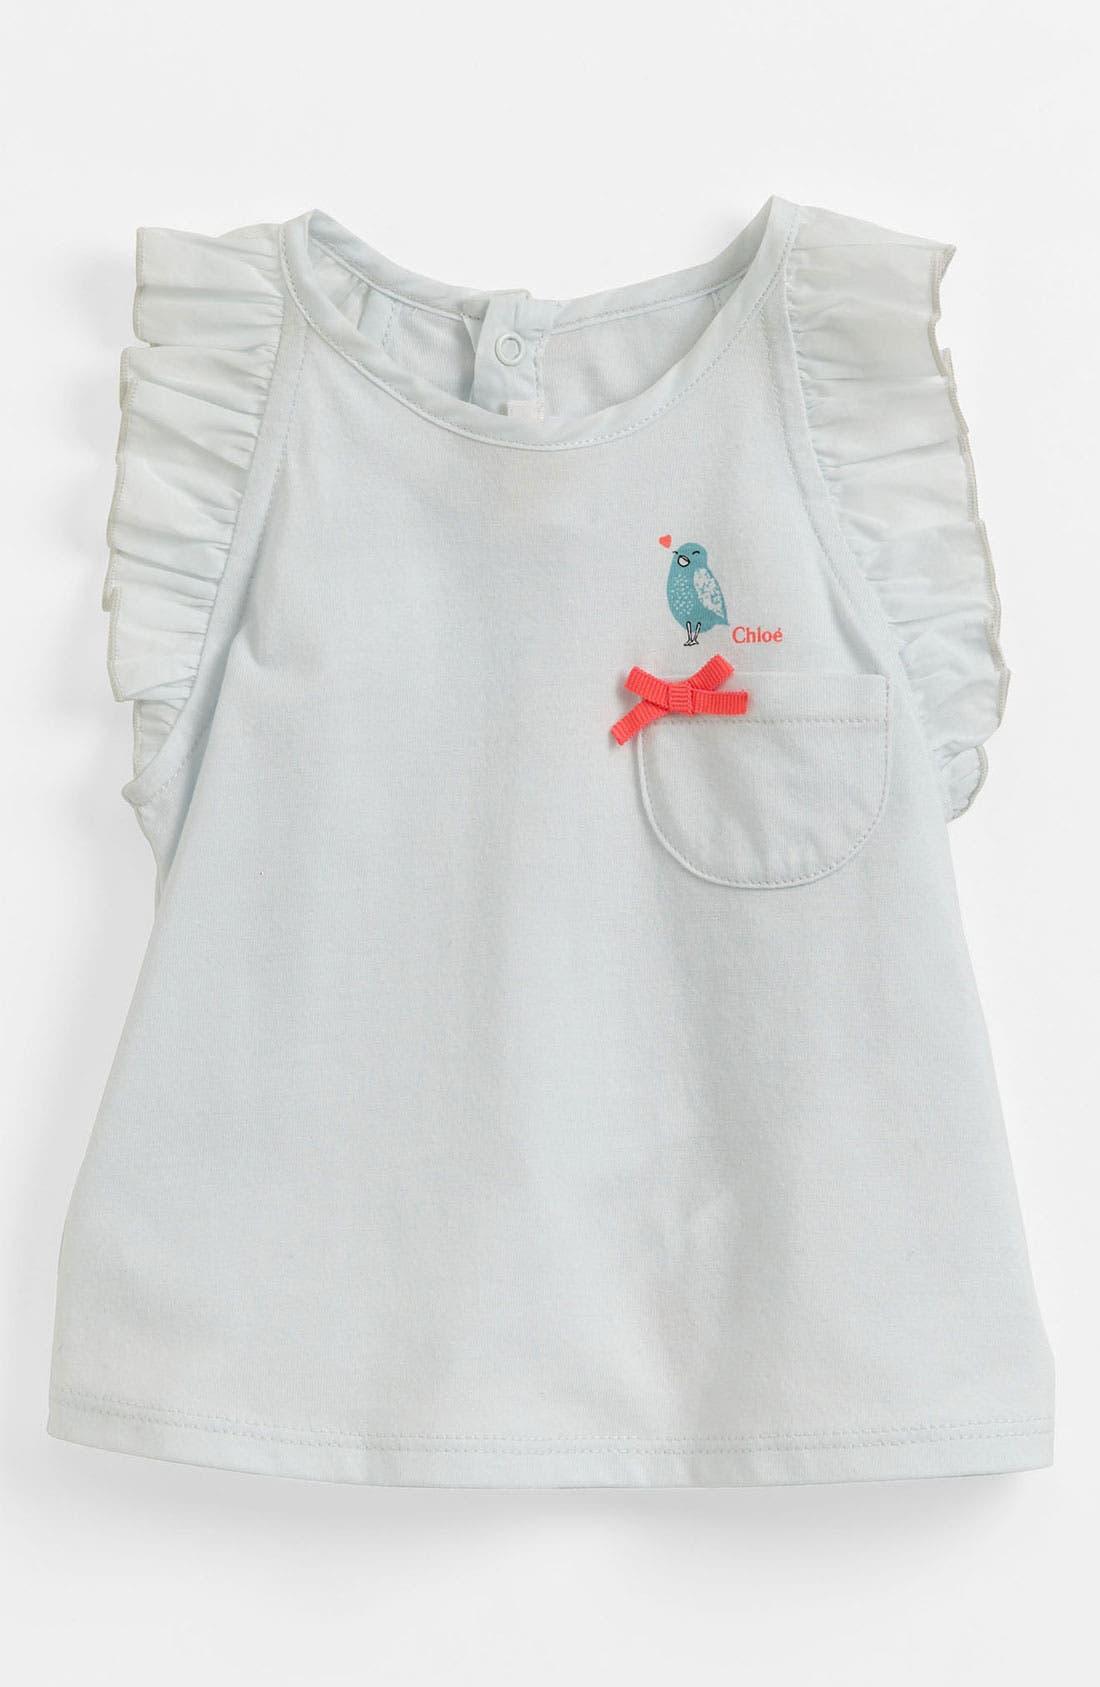 Alternate Image 1 Selected - Chloé Ruffle Sleeve Tank Top (Baby)